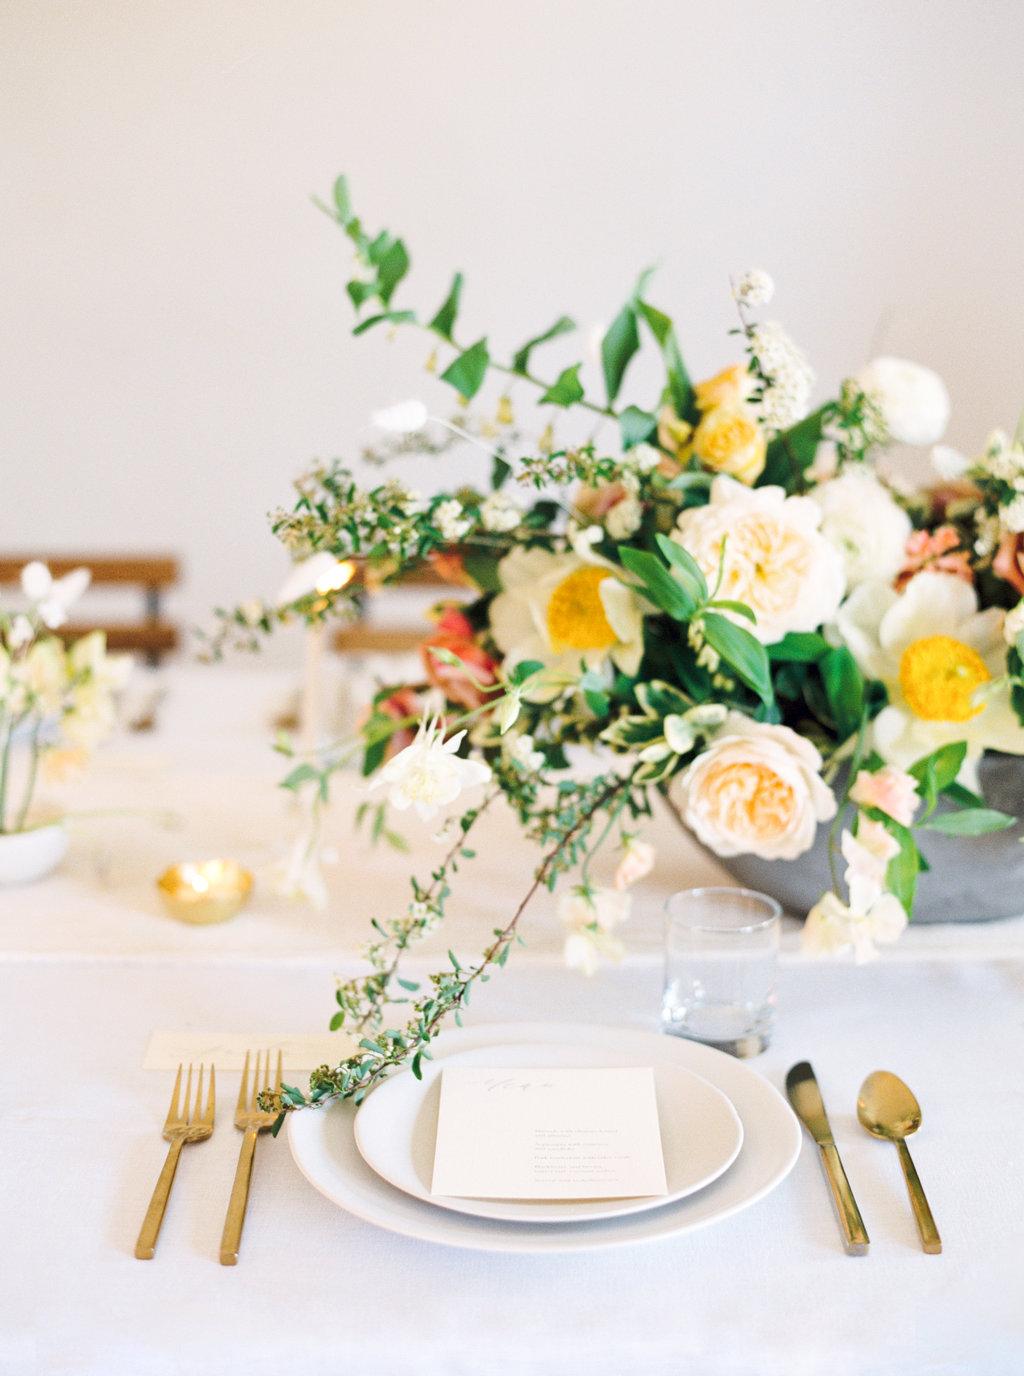 Kelsea_Holder_Photography_Rava_Wines_Bloom_Floral_and_Foliage_4.jpg